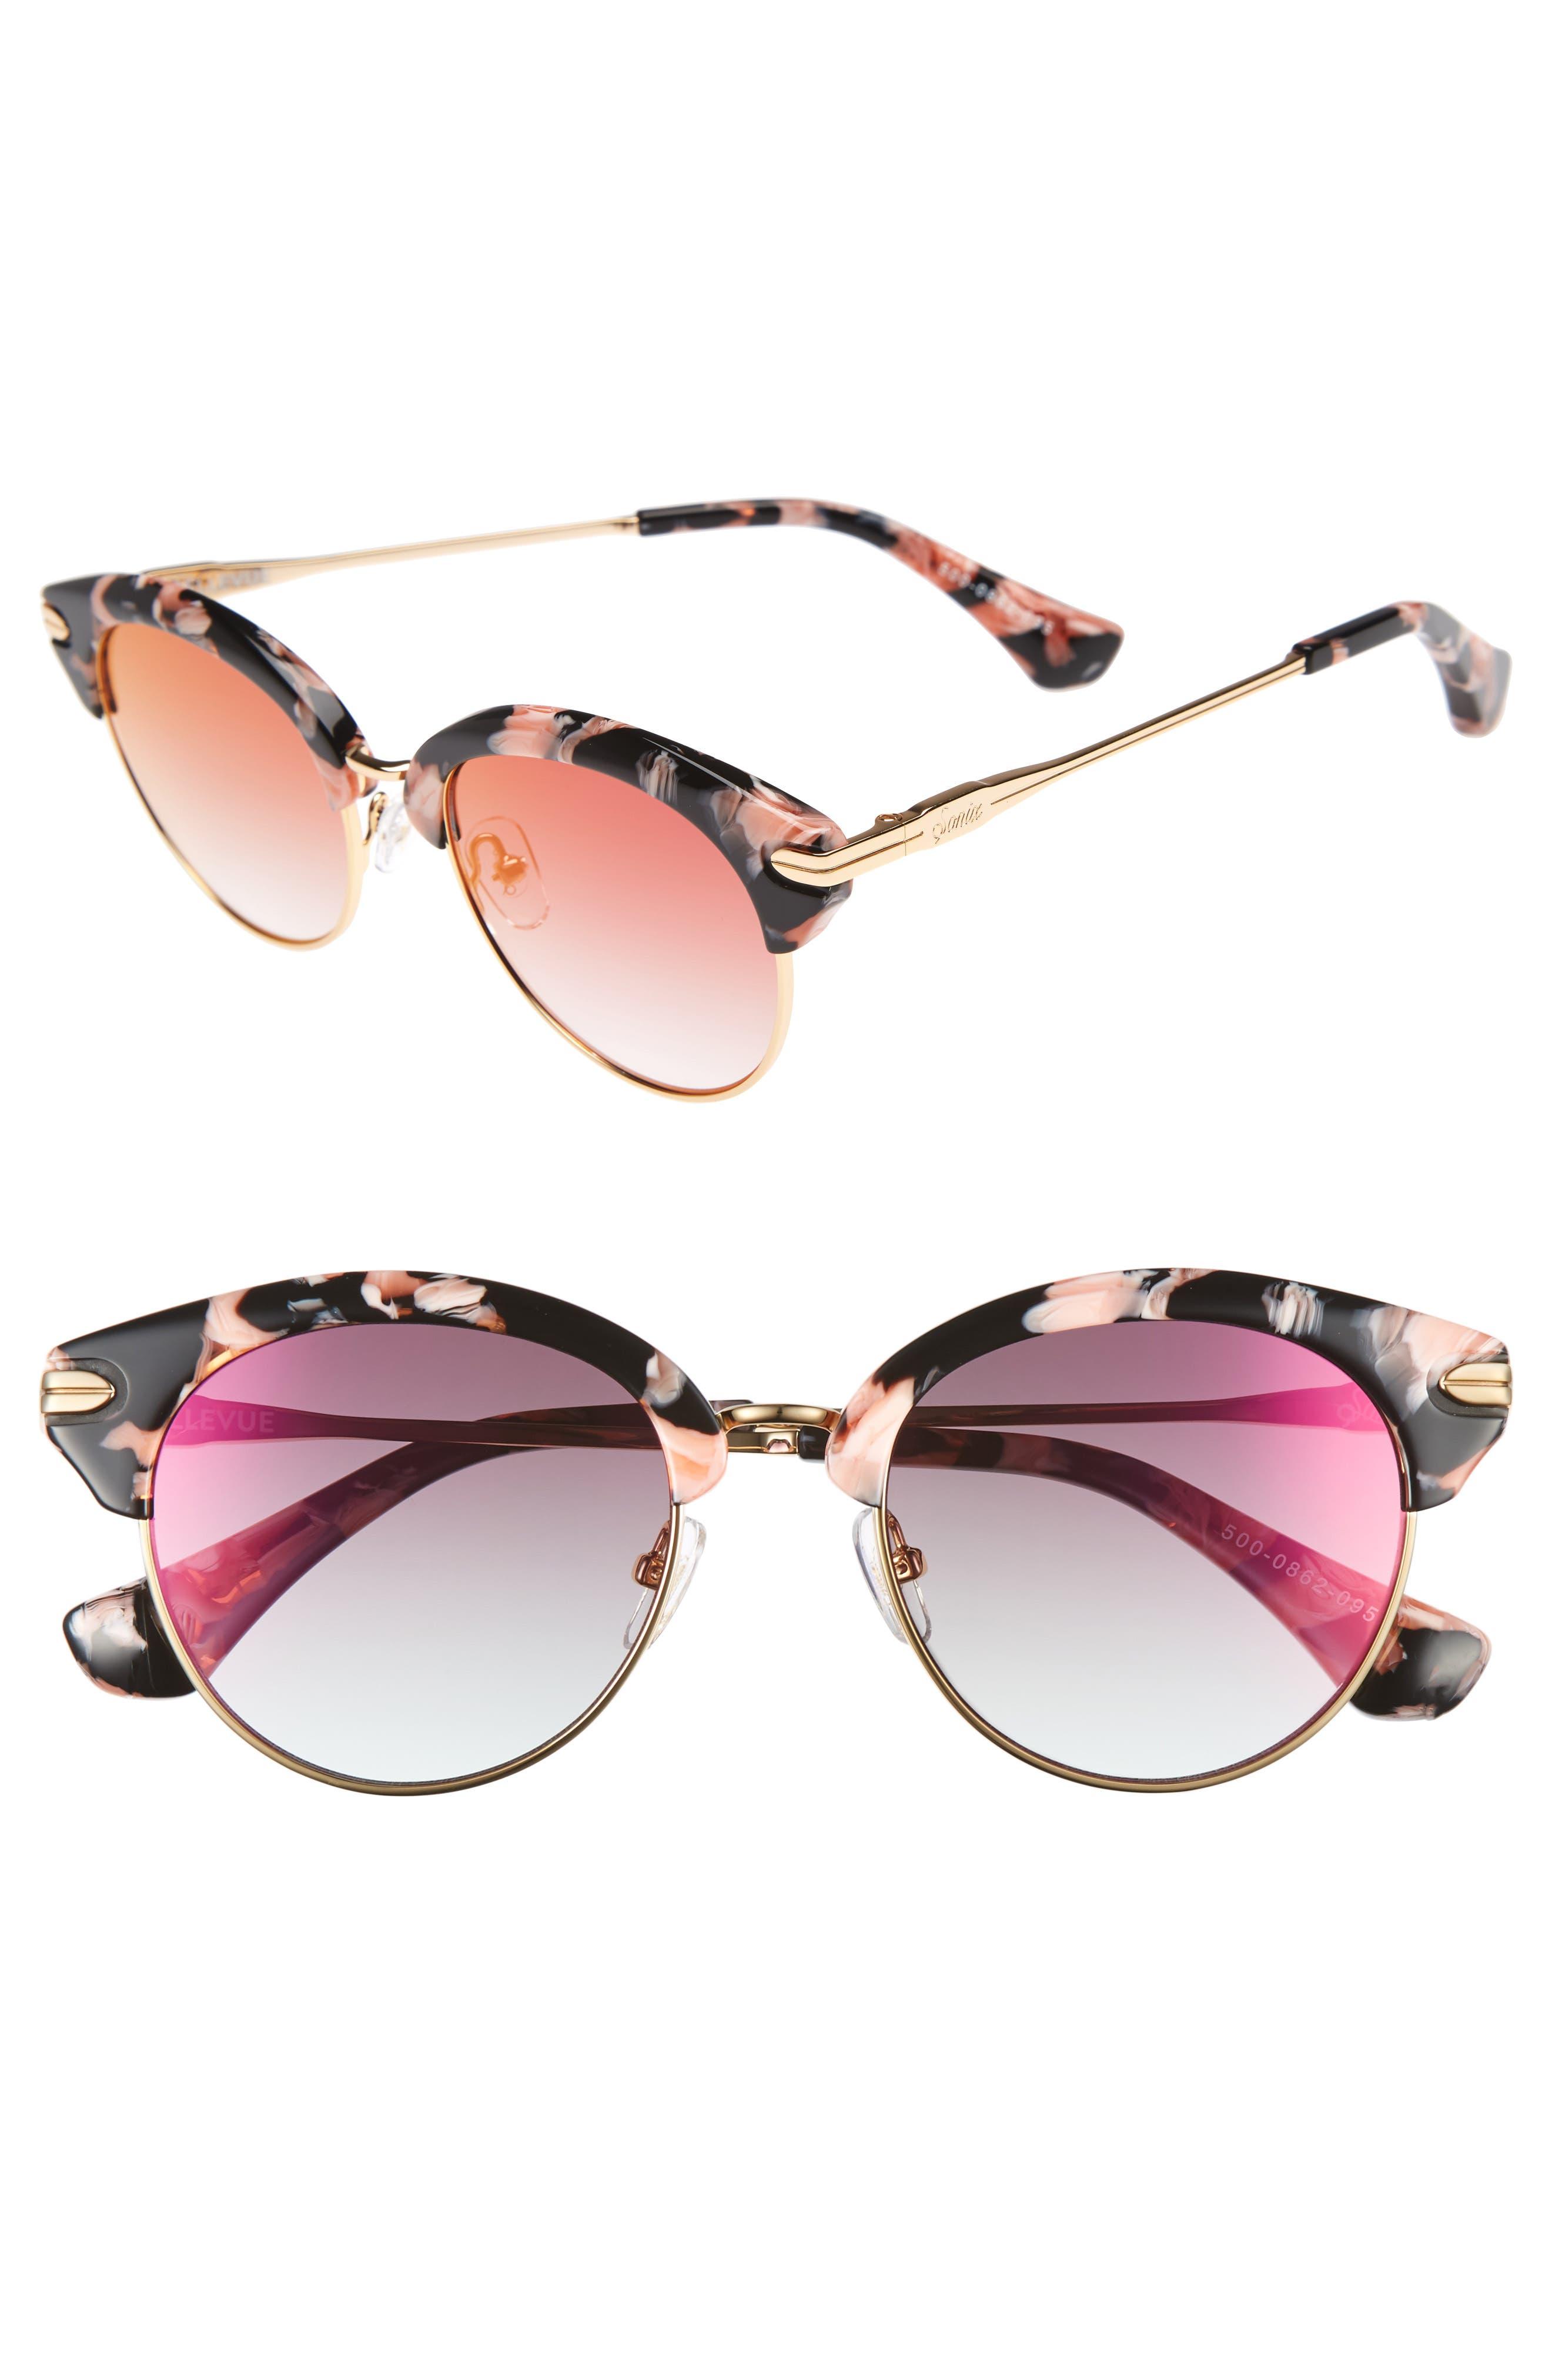 Bellevue 50mm Mirrored Sunglasses,                         Main,                         color, Rose Tort/ Magenta Mirror